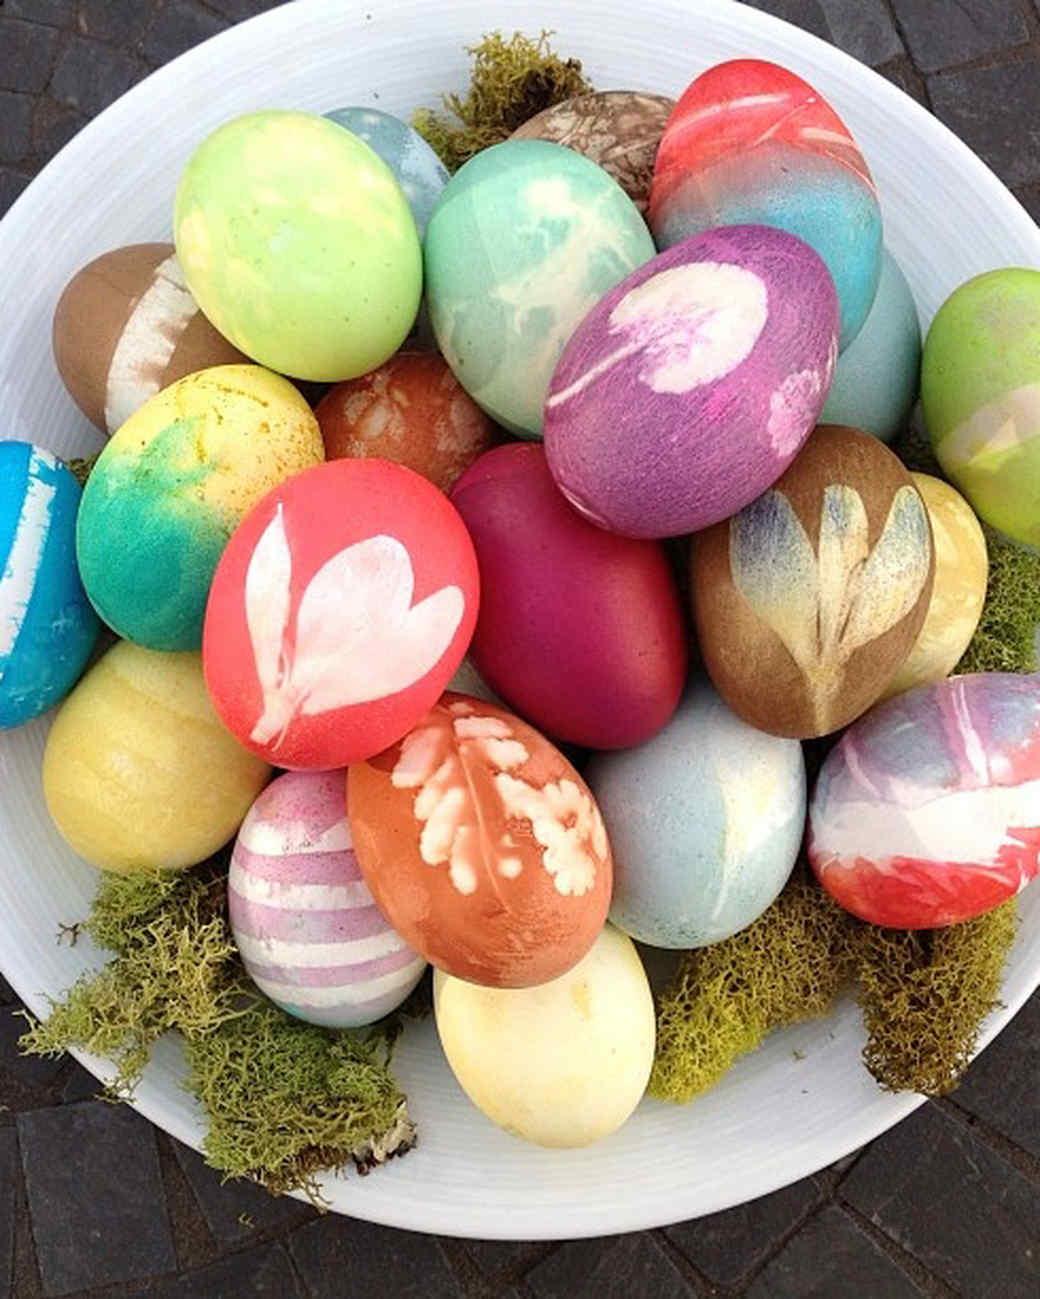 marthas-egg-hunt-marisagrams-0414.jpg